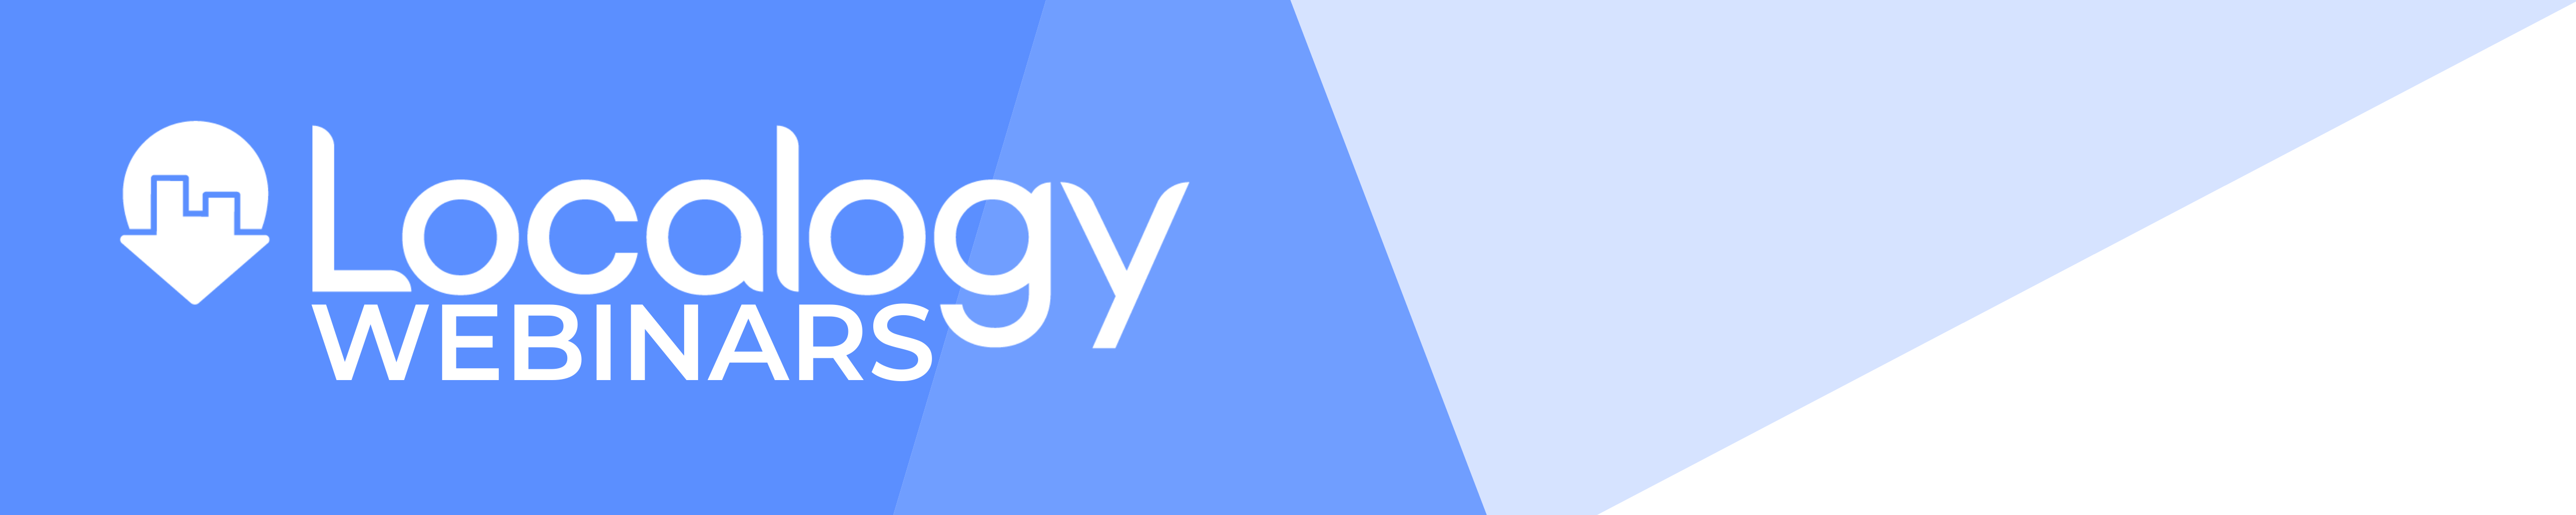 Localogy WEBINARS - Landing Page Banner (1)-1